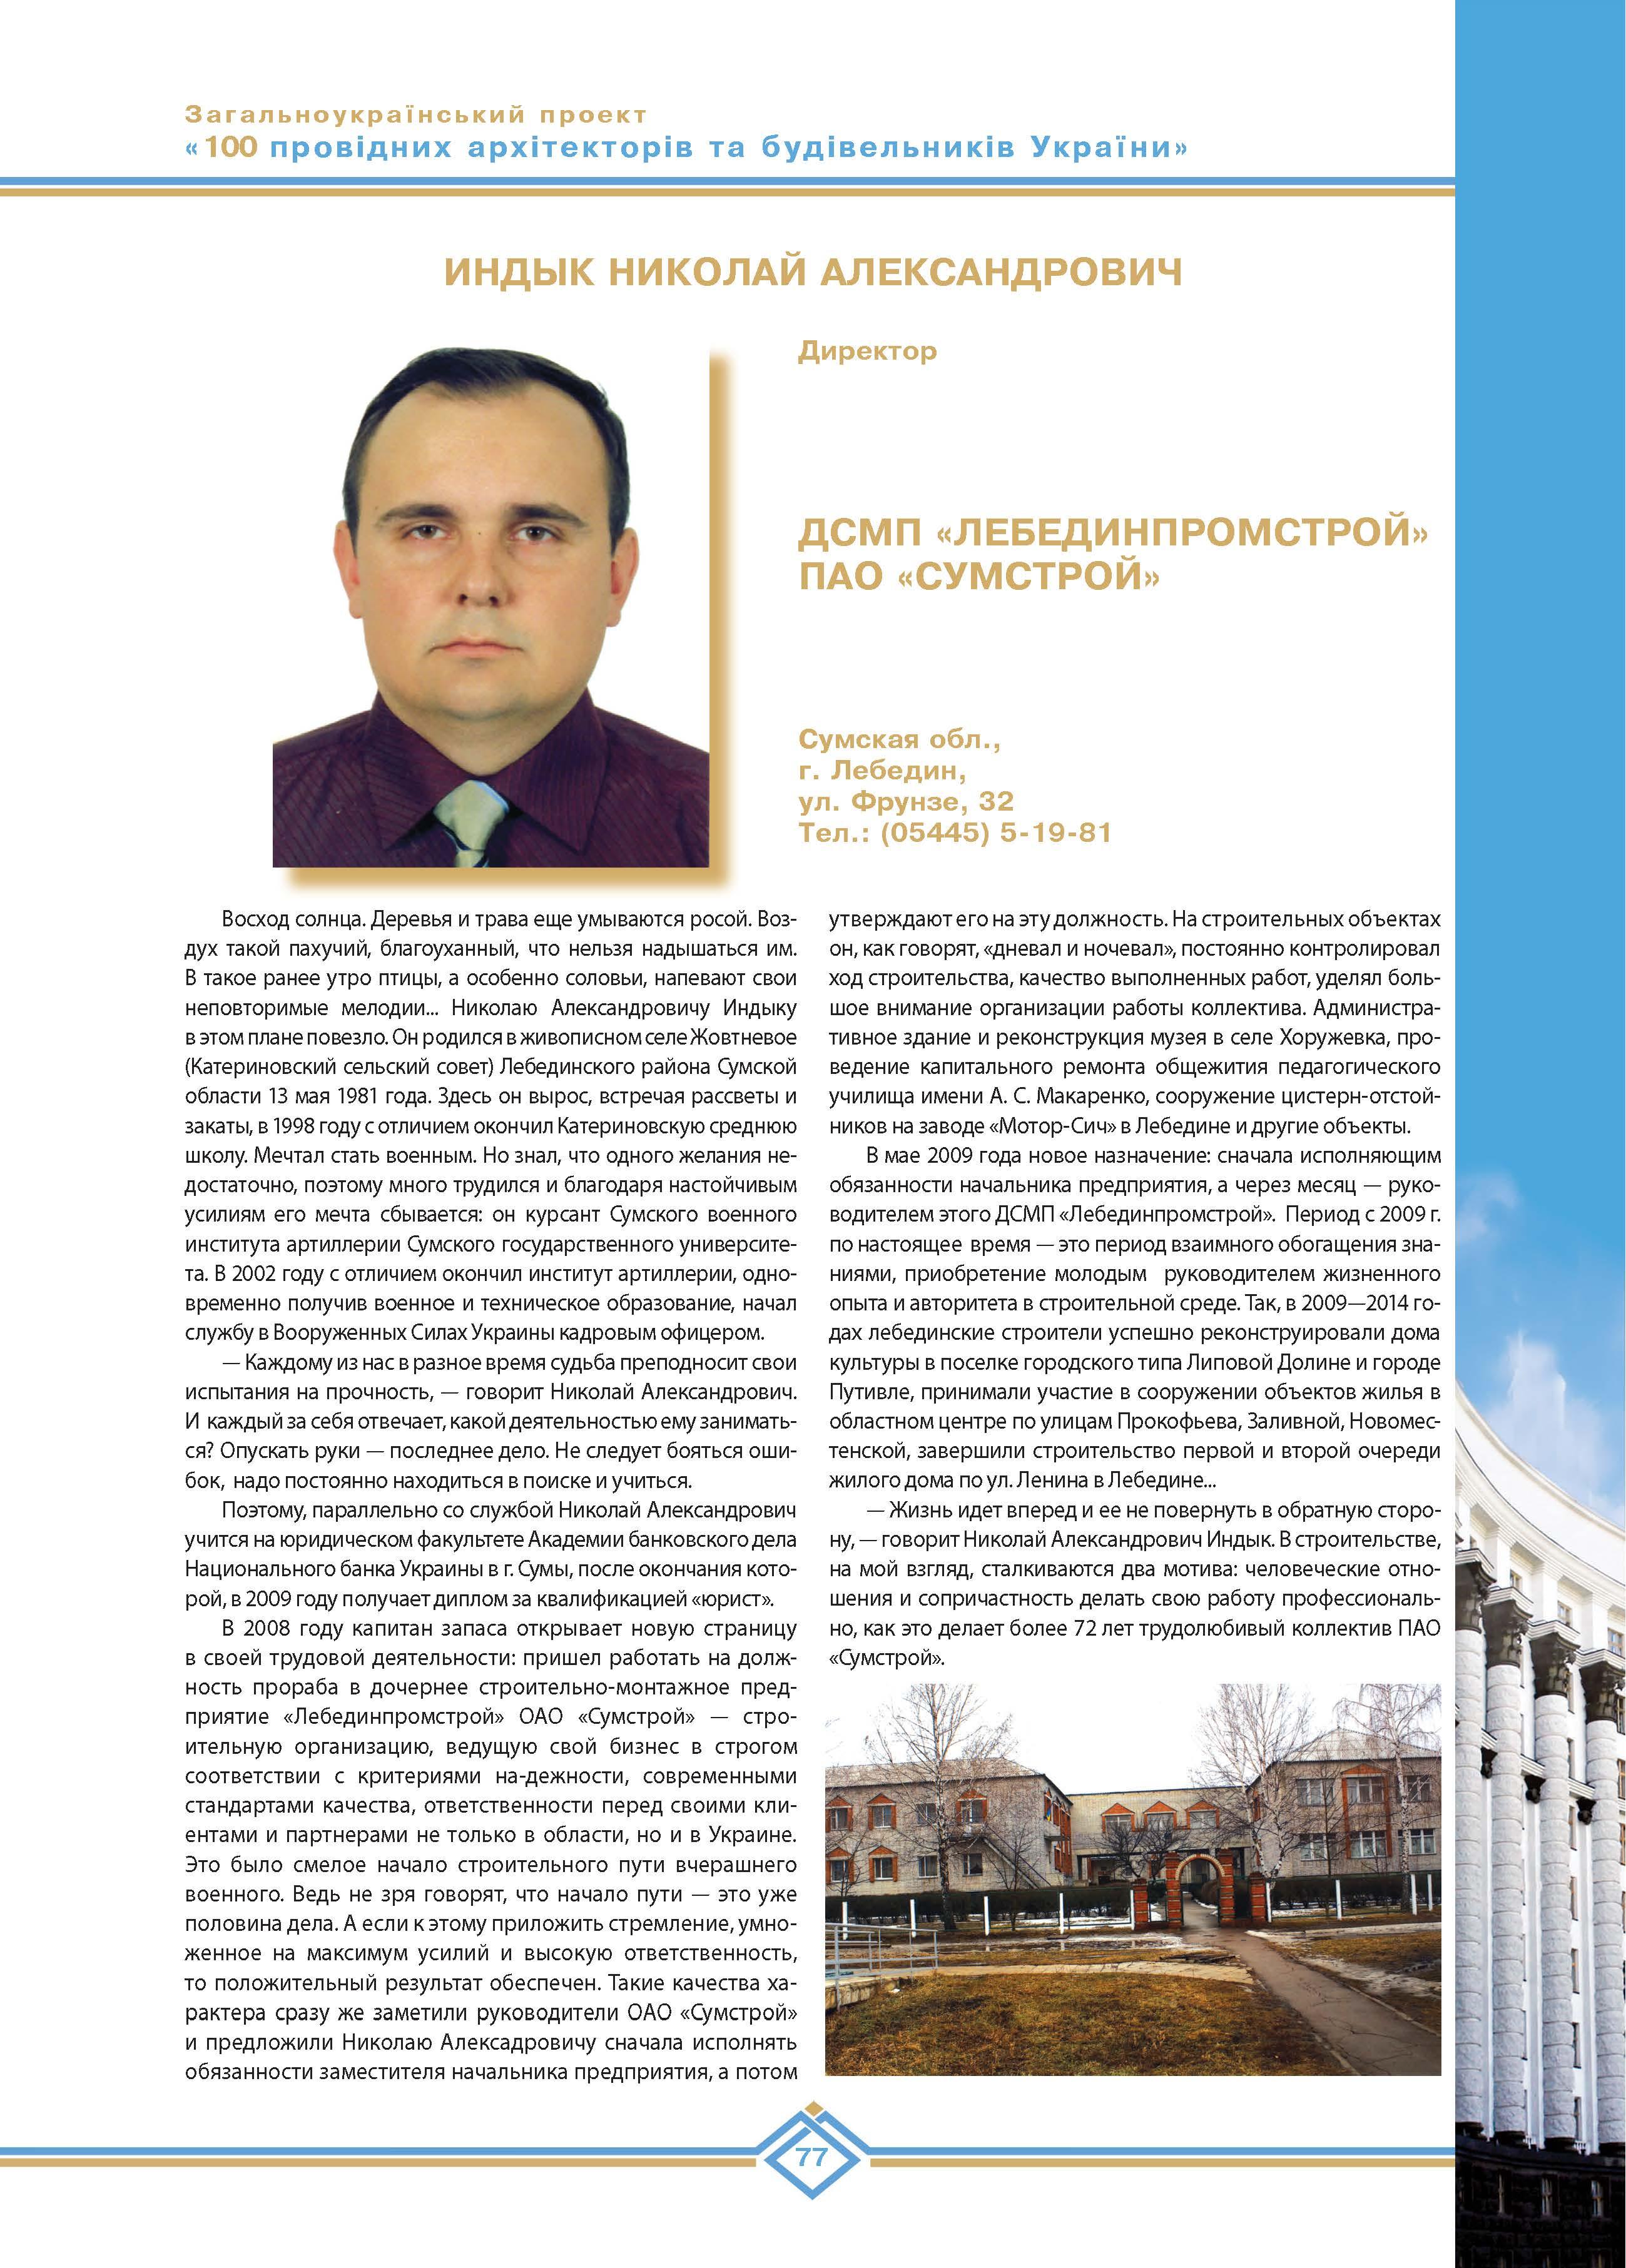 Индык Николай Александрович